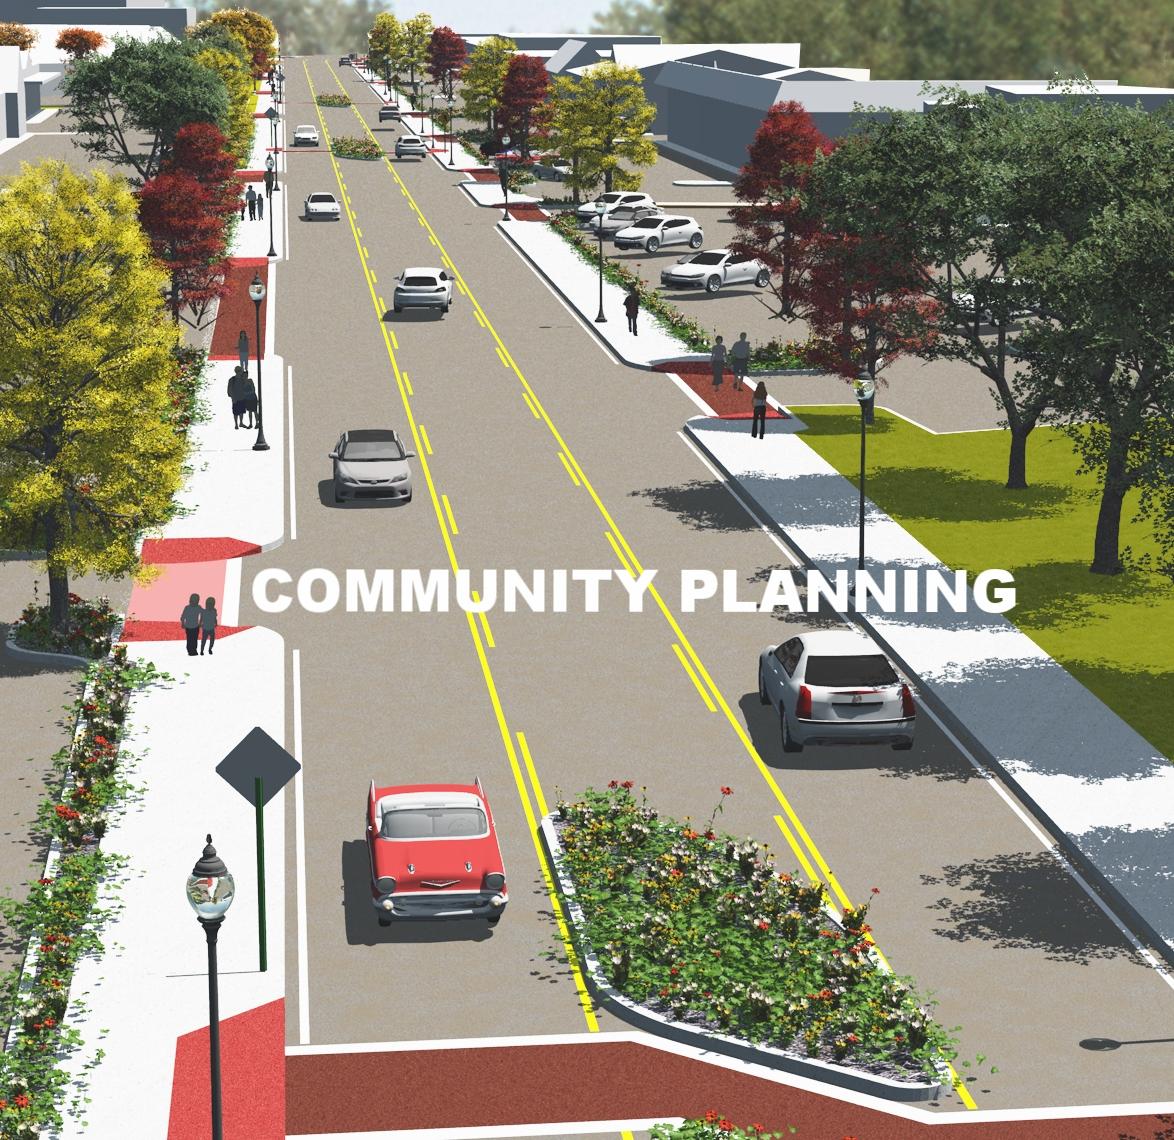 community plan pic.jpg